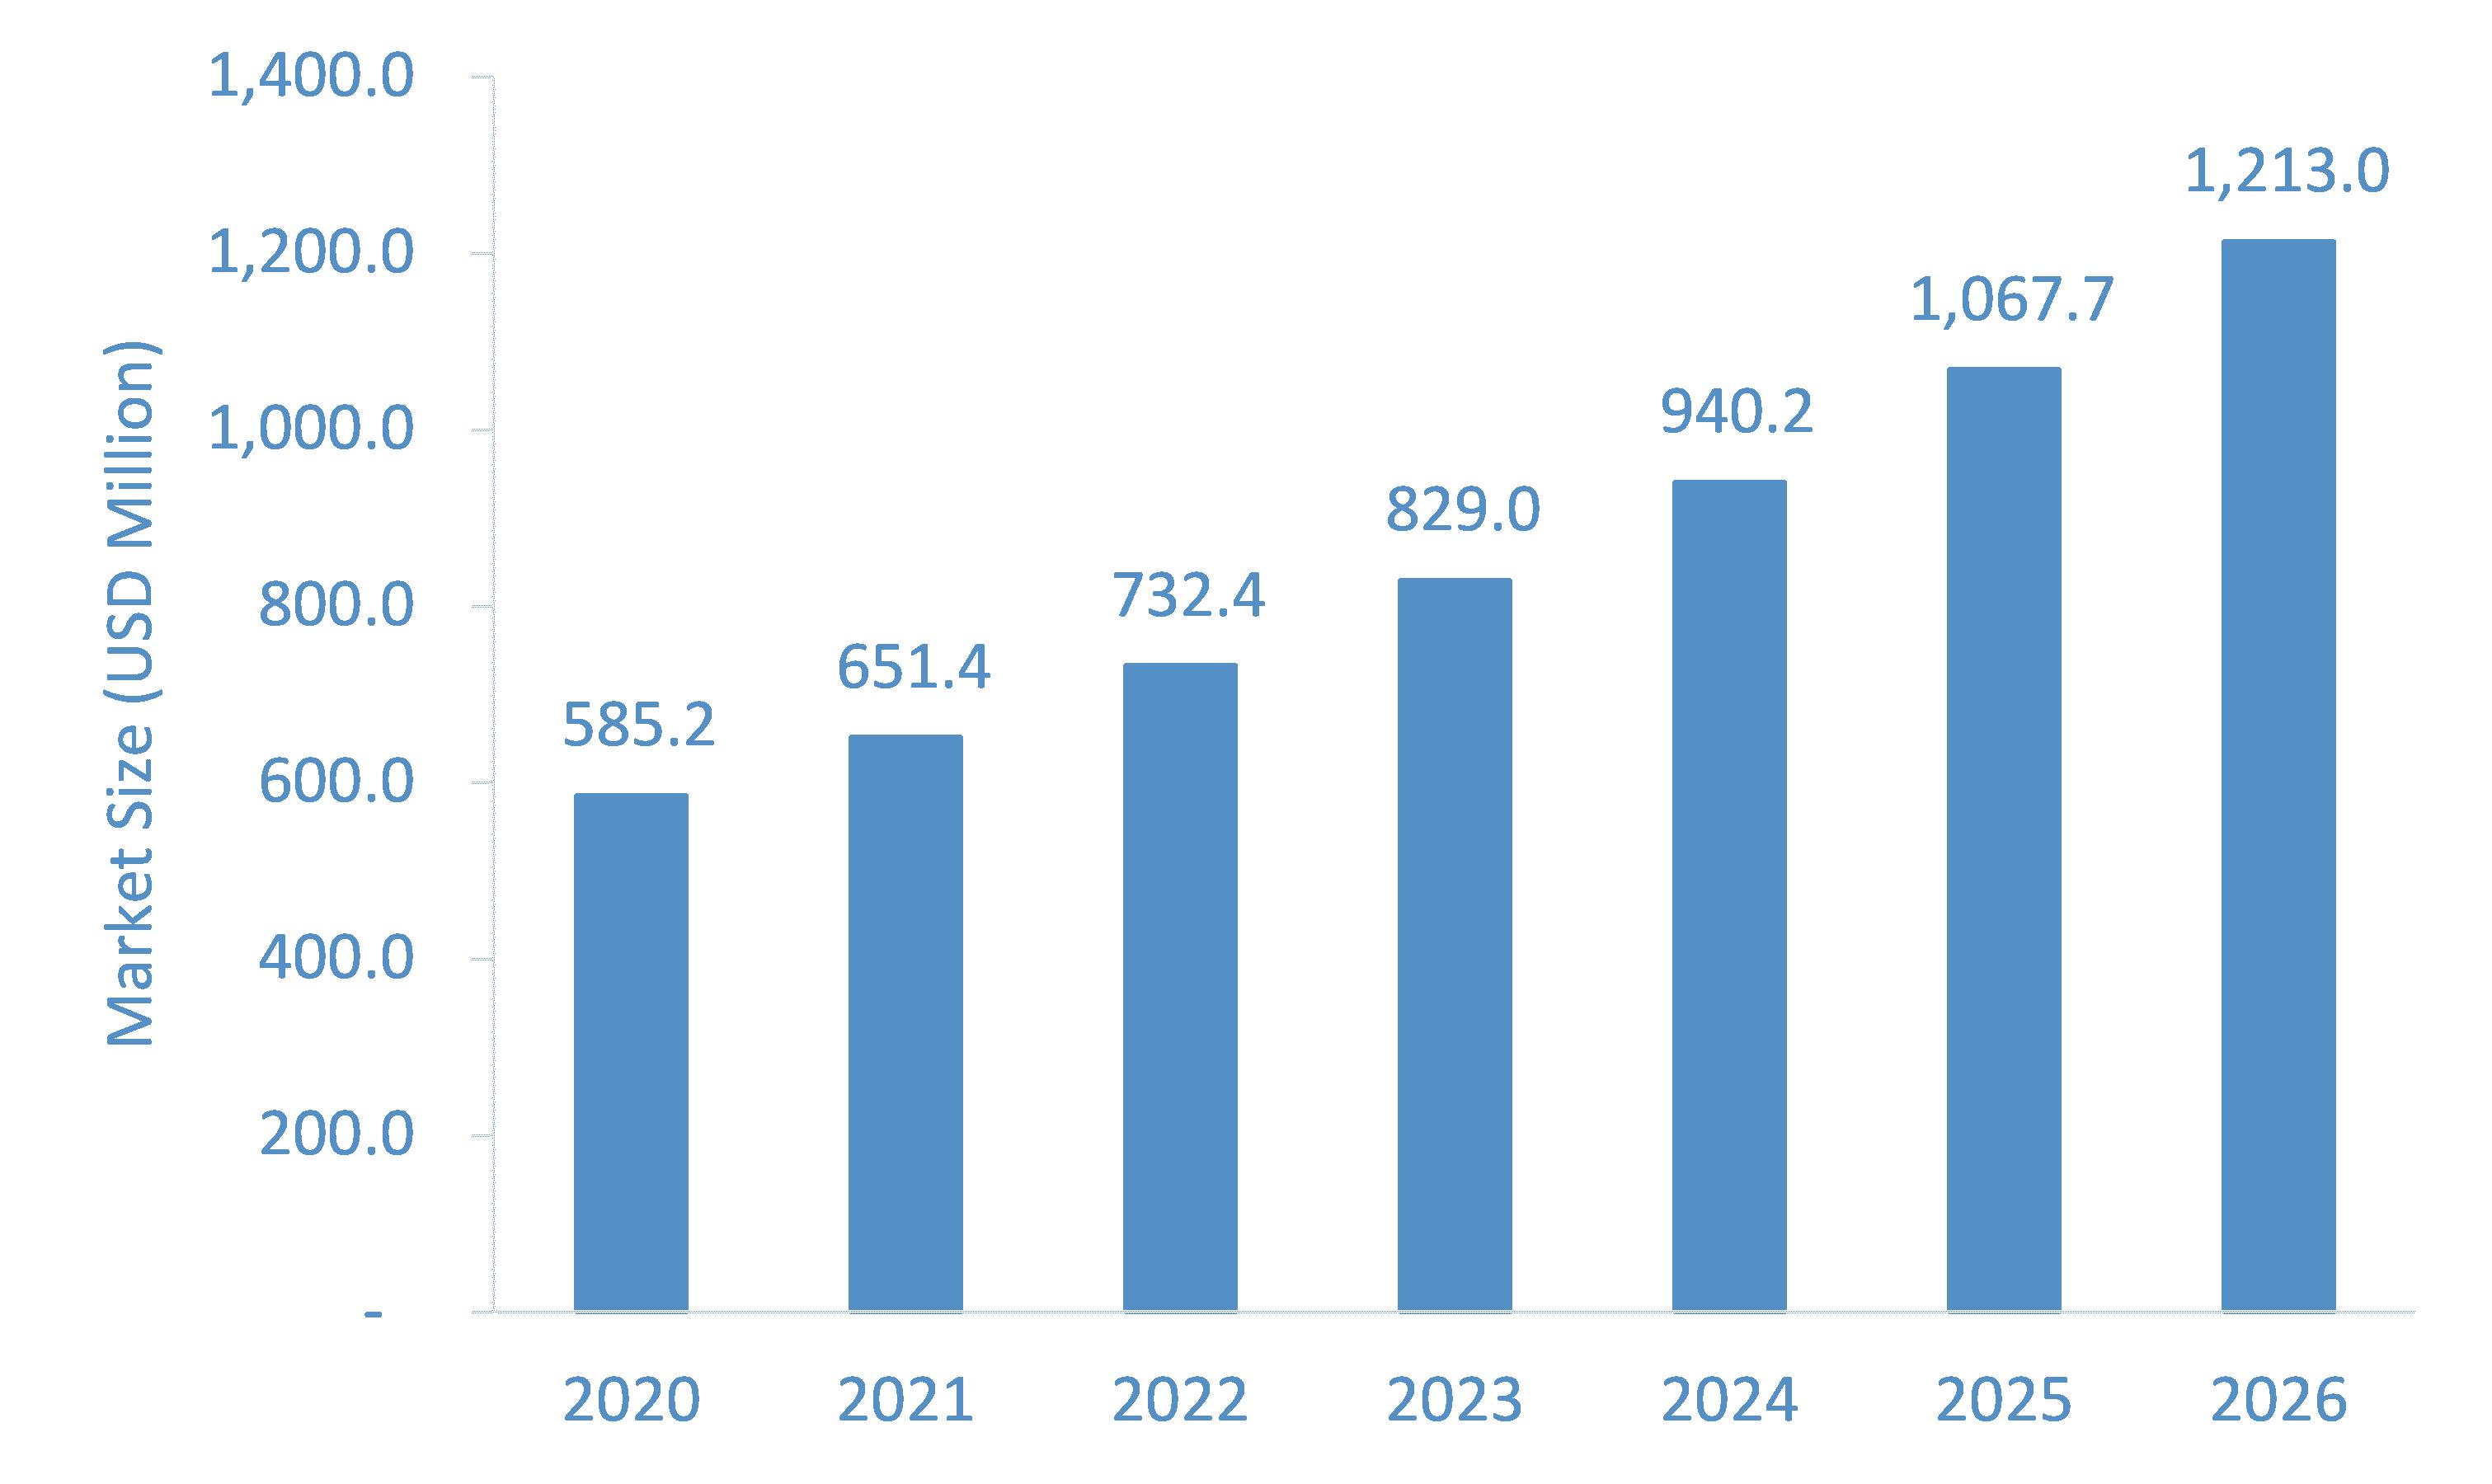 Digital Pathology Market: Key Success Factors, Growth Trends & Forecast 2022-2026